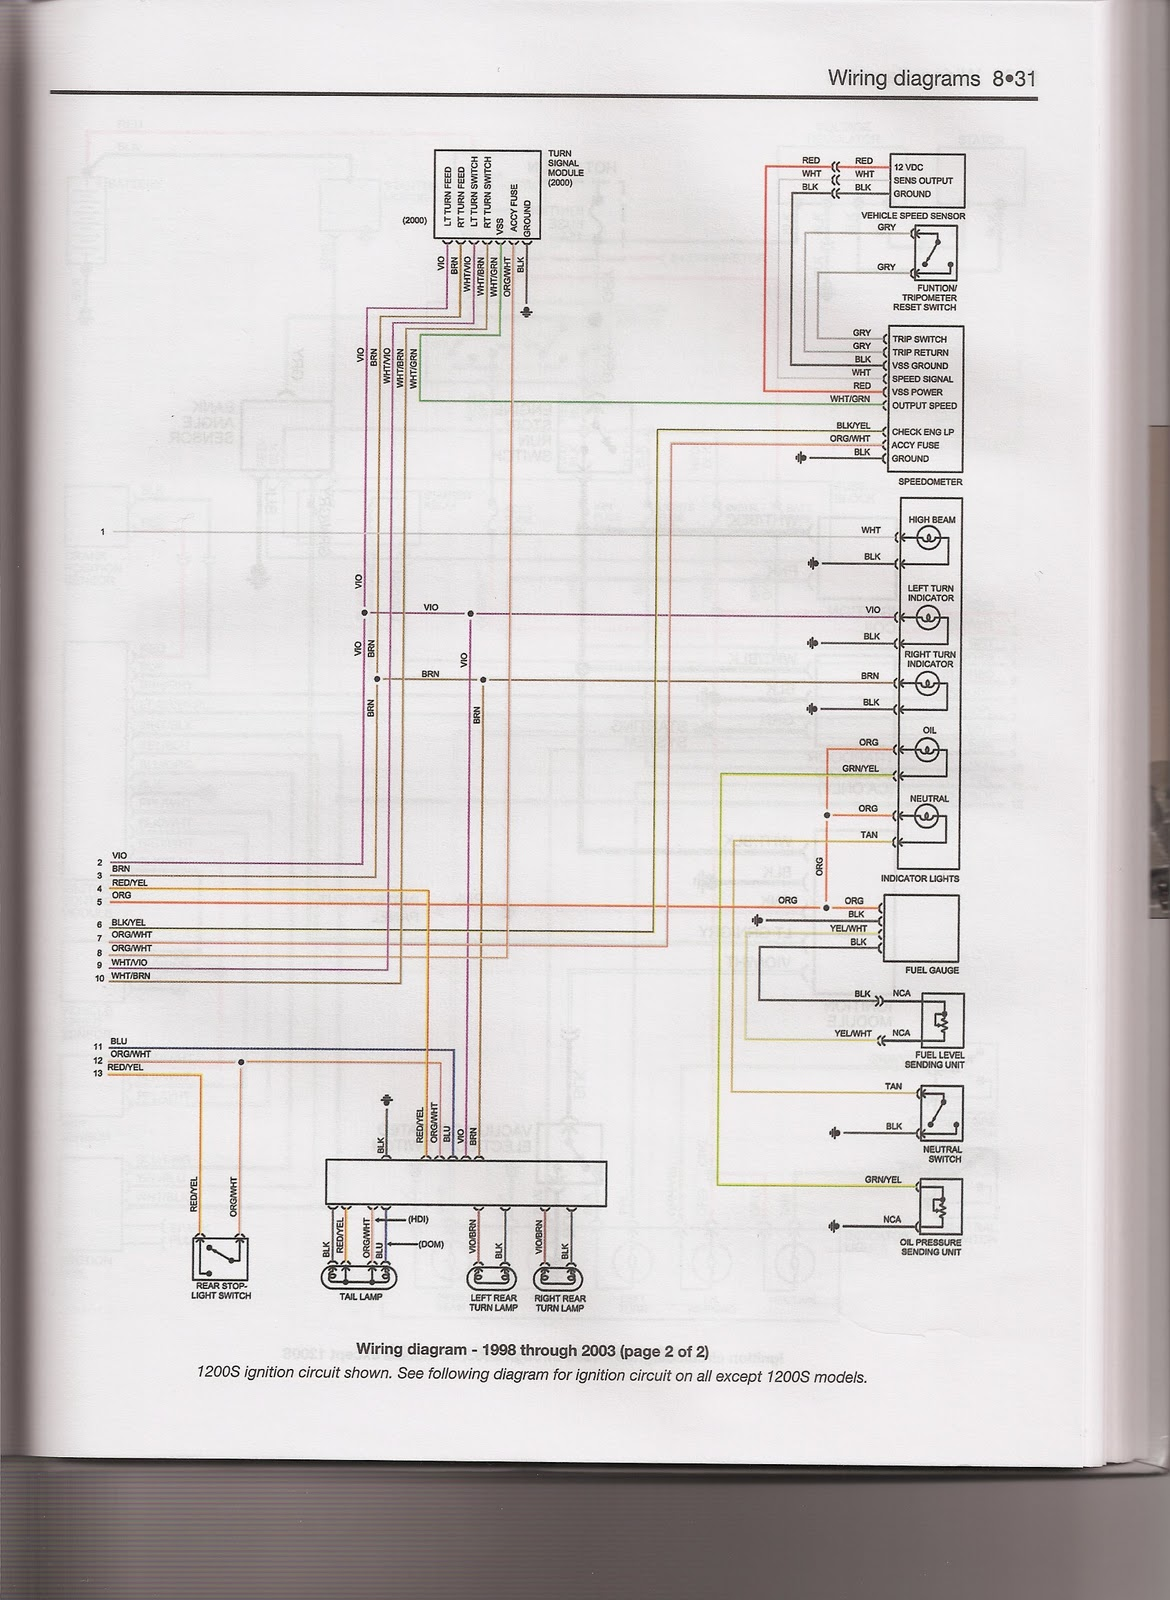 small resolution of kracker jacks wiring diagrams for a 98 03 sportster rh krackerjacksc blogspot com 77 sportster wiring